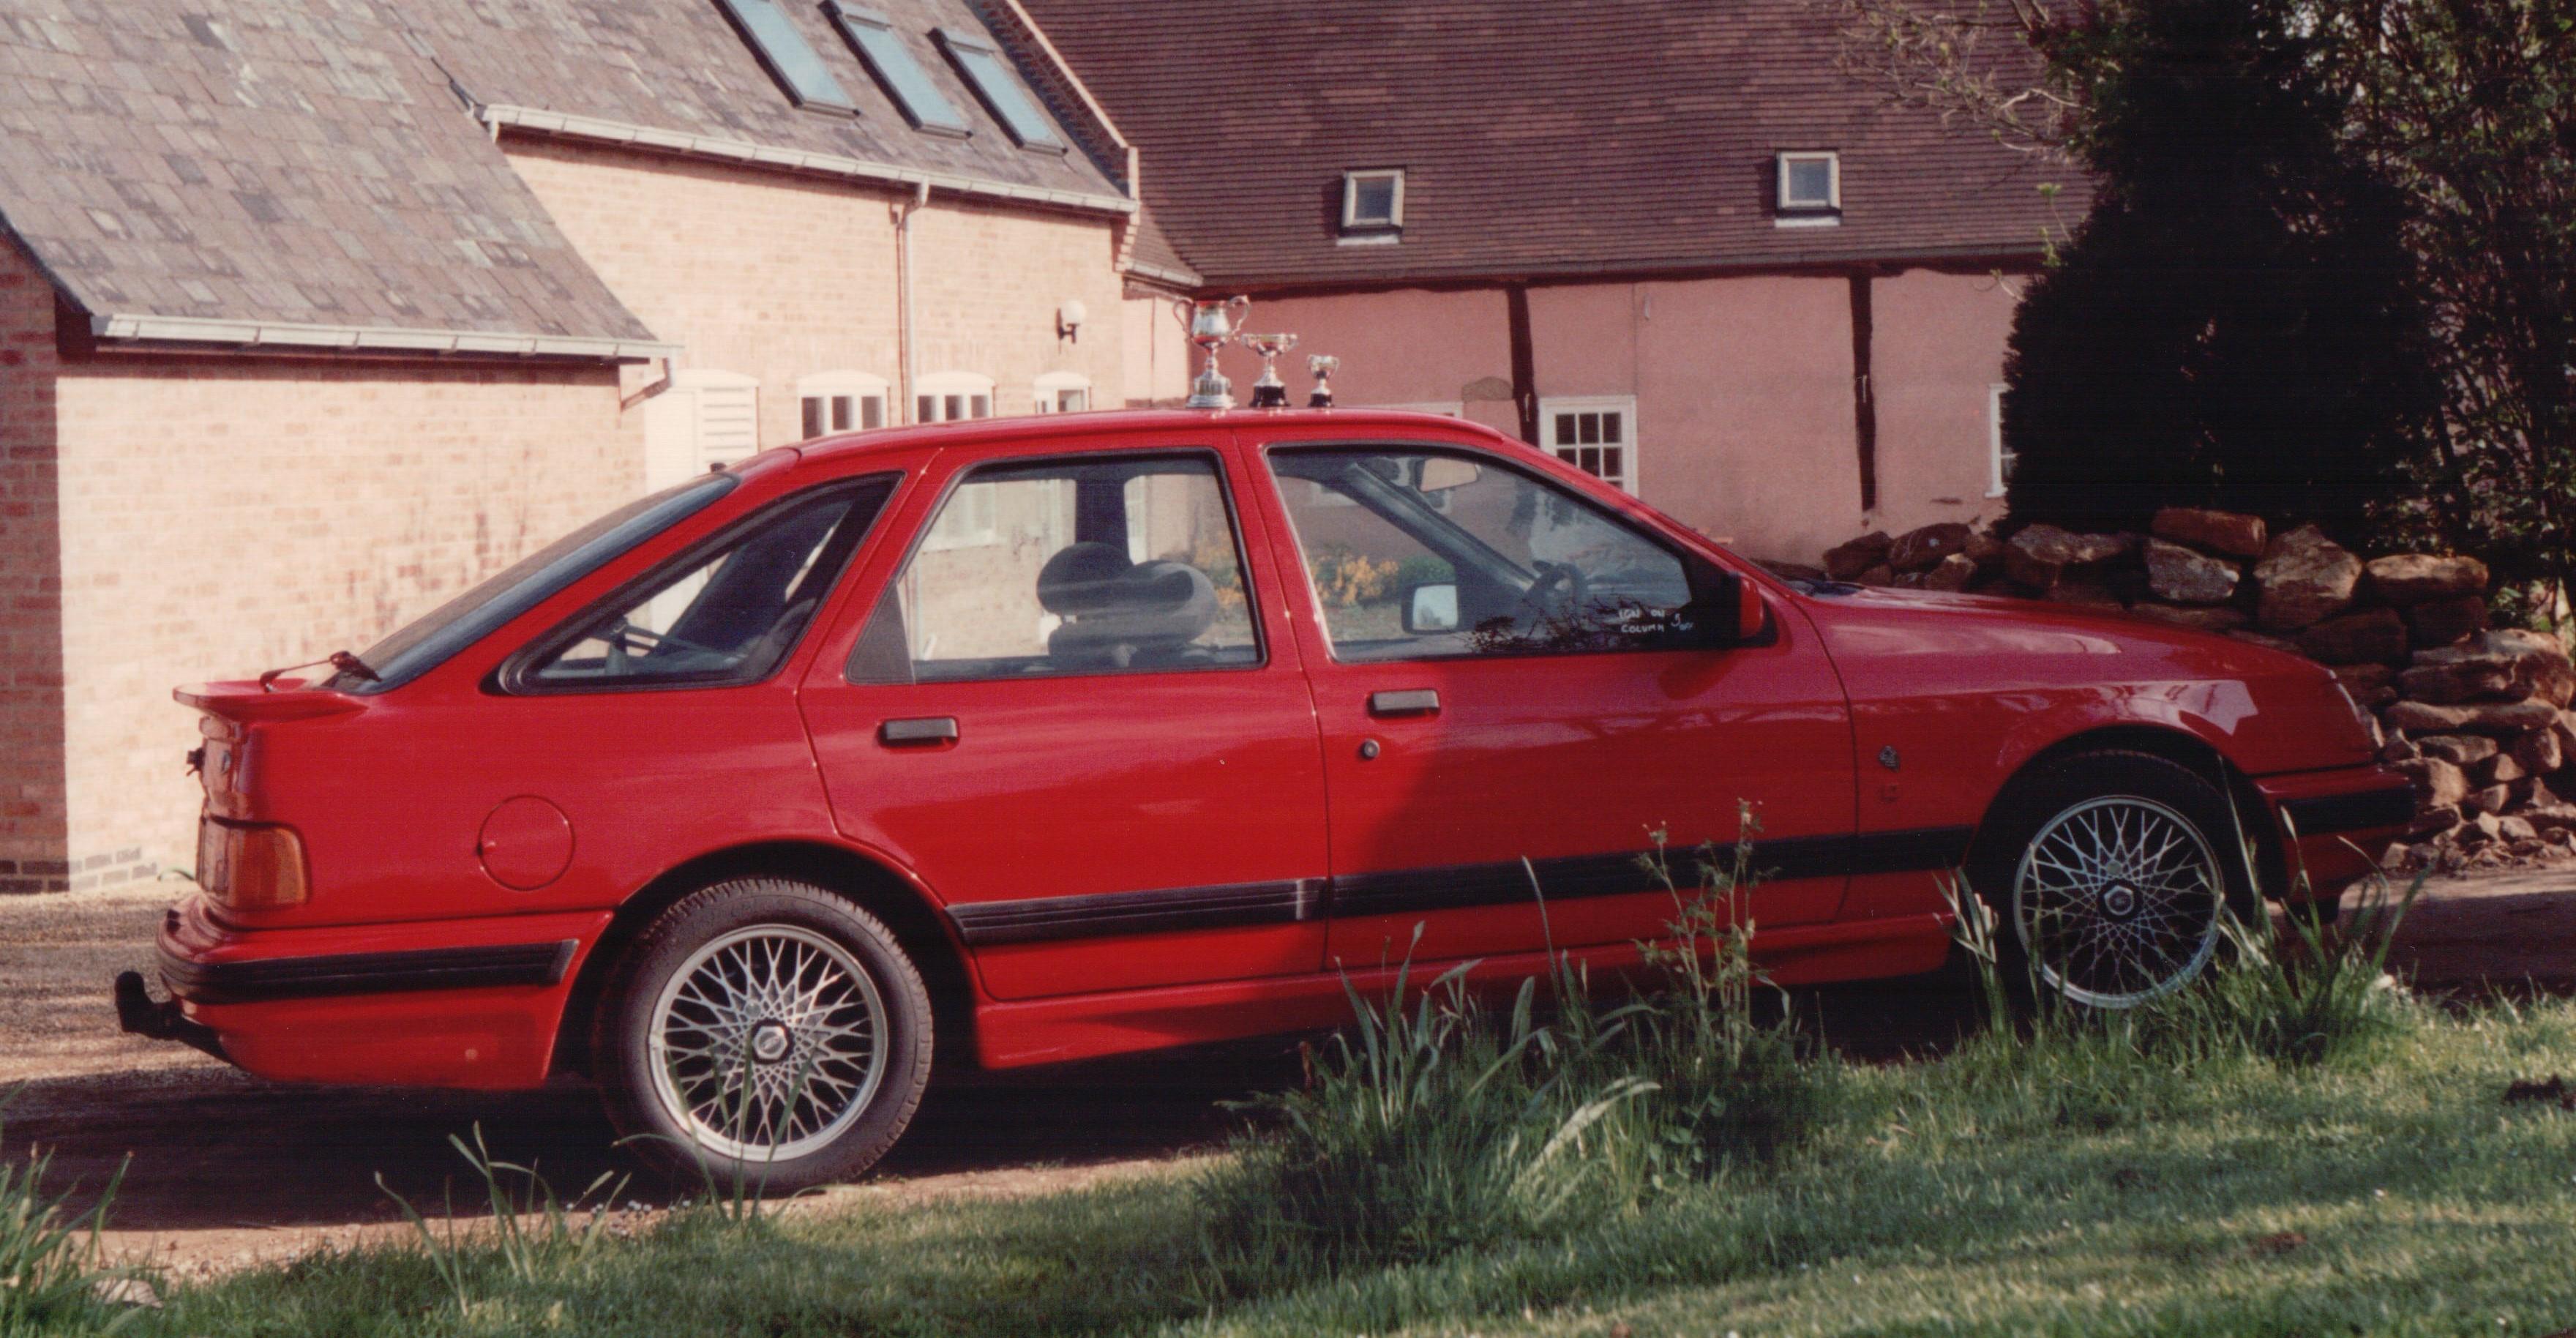 Ford Sierra XR4X4 twin turbo, Slawston 1987